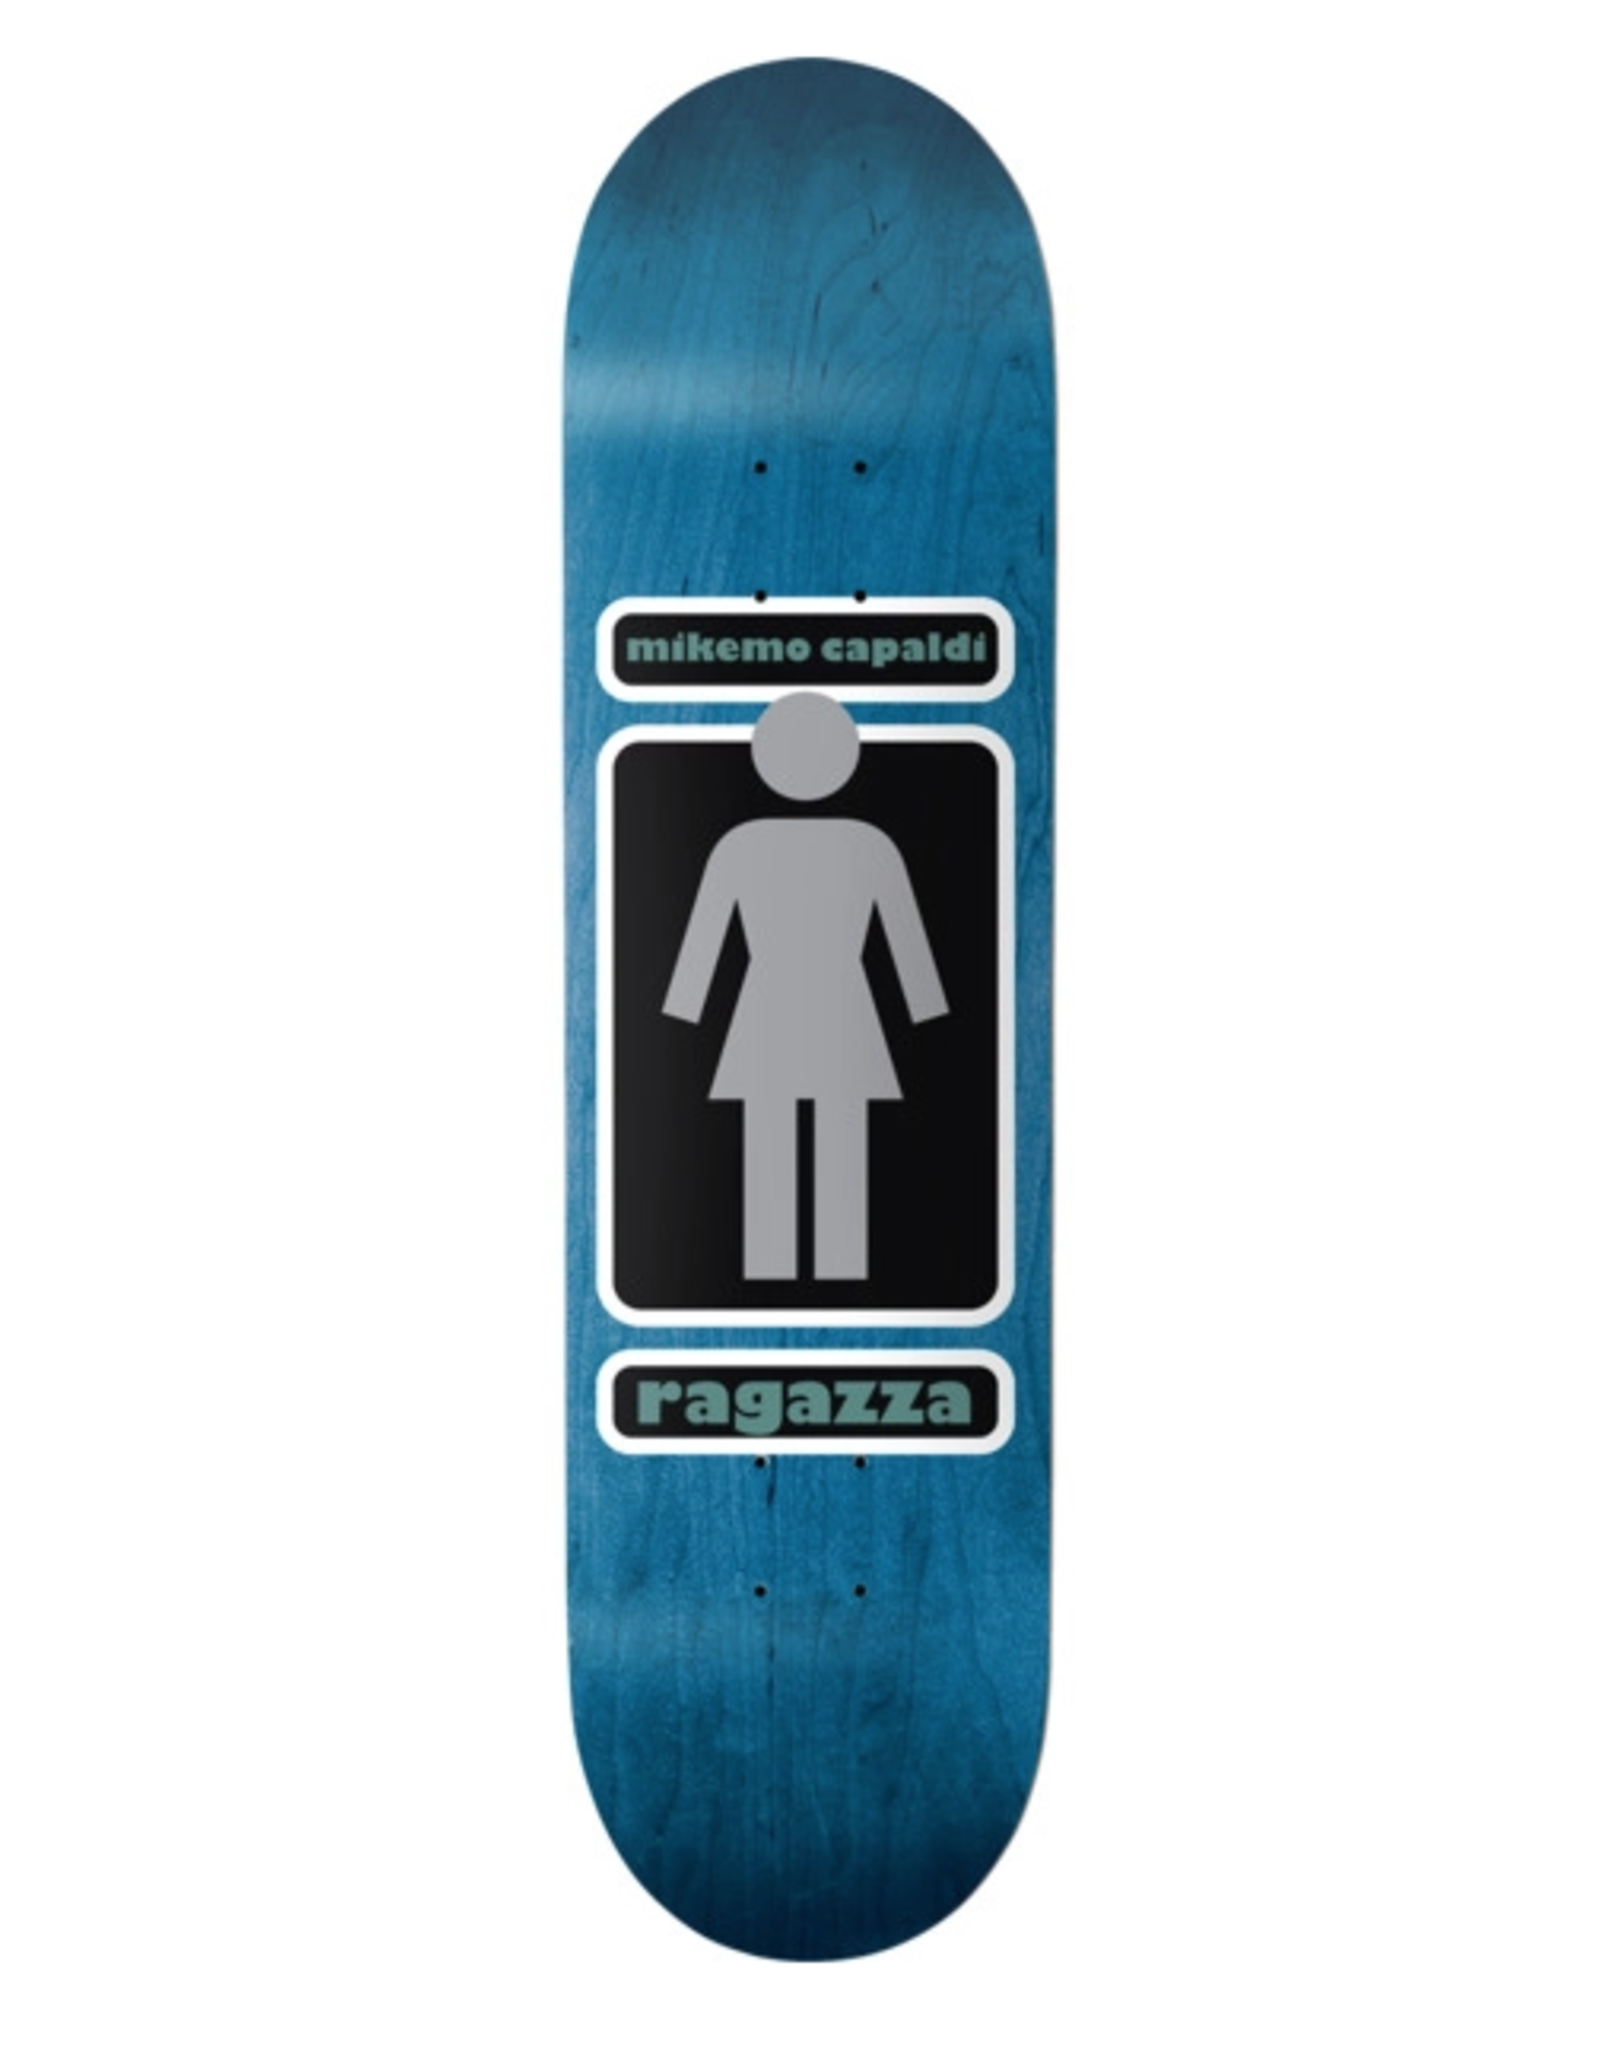 "GIRL Girl Skateboards Mike Mo Capaldi 93 Til WR39D3 Skateboard Deck - 8.12"" x 32"""